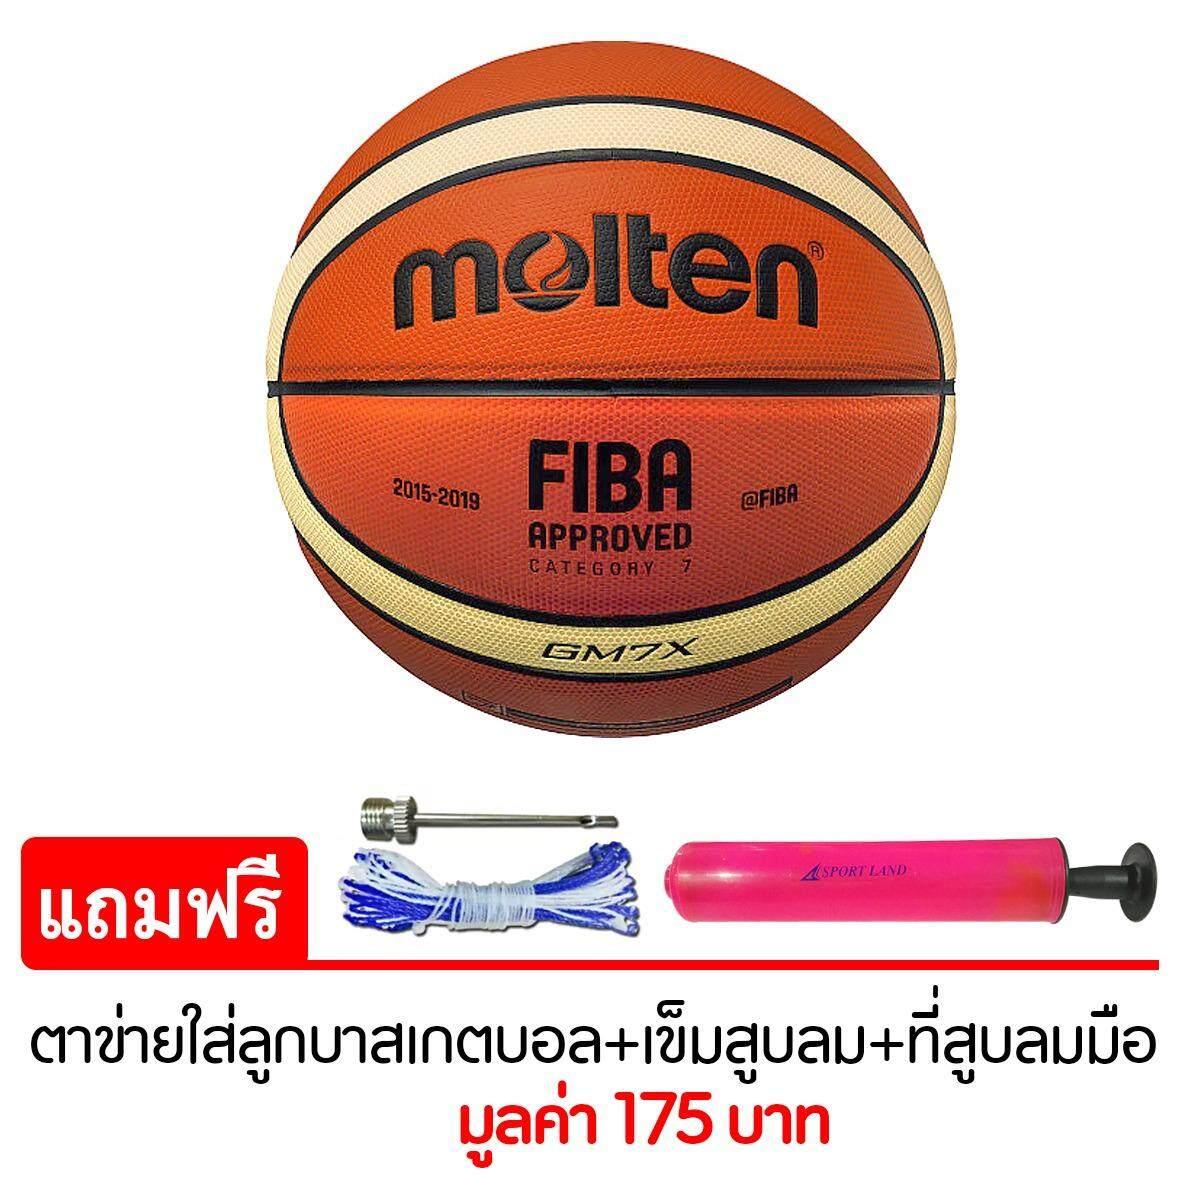 MOLTEN บาสเก็ตบอล รุ่น BGM7X FIBA แถมฟรี ตาข่ายใส่ลูกบาสเกตบอล + เข็มสูบสูบลม + สูบมือ SPL รุ่น SL6 สีชมพู